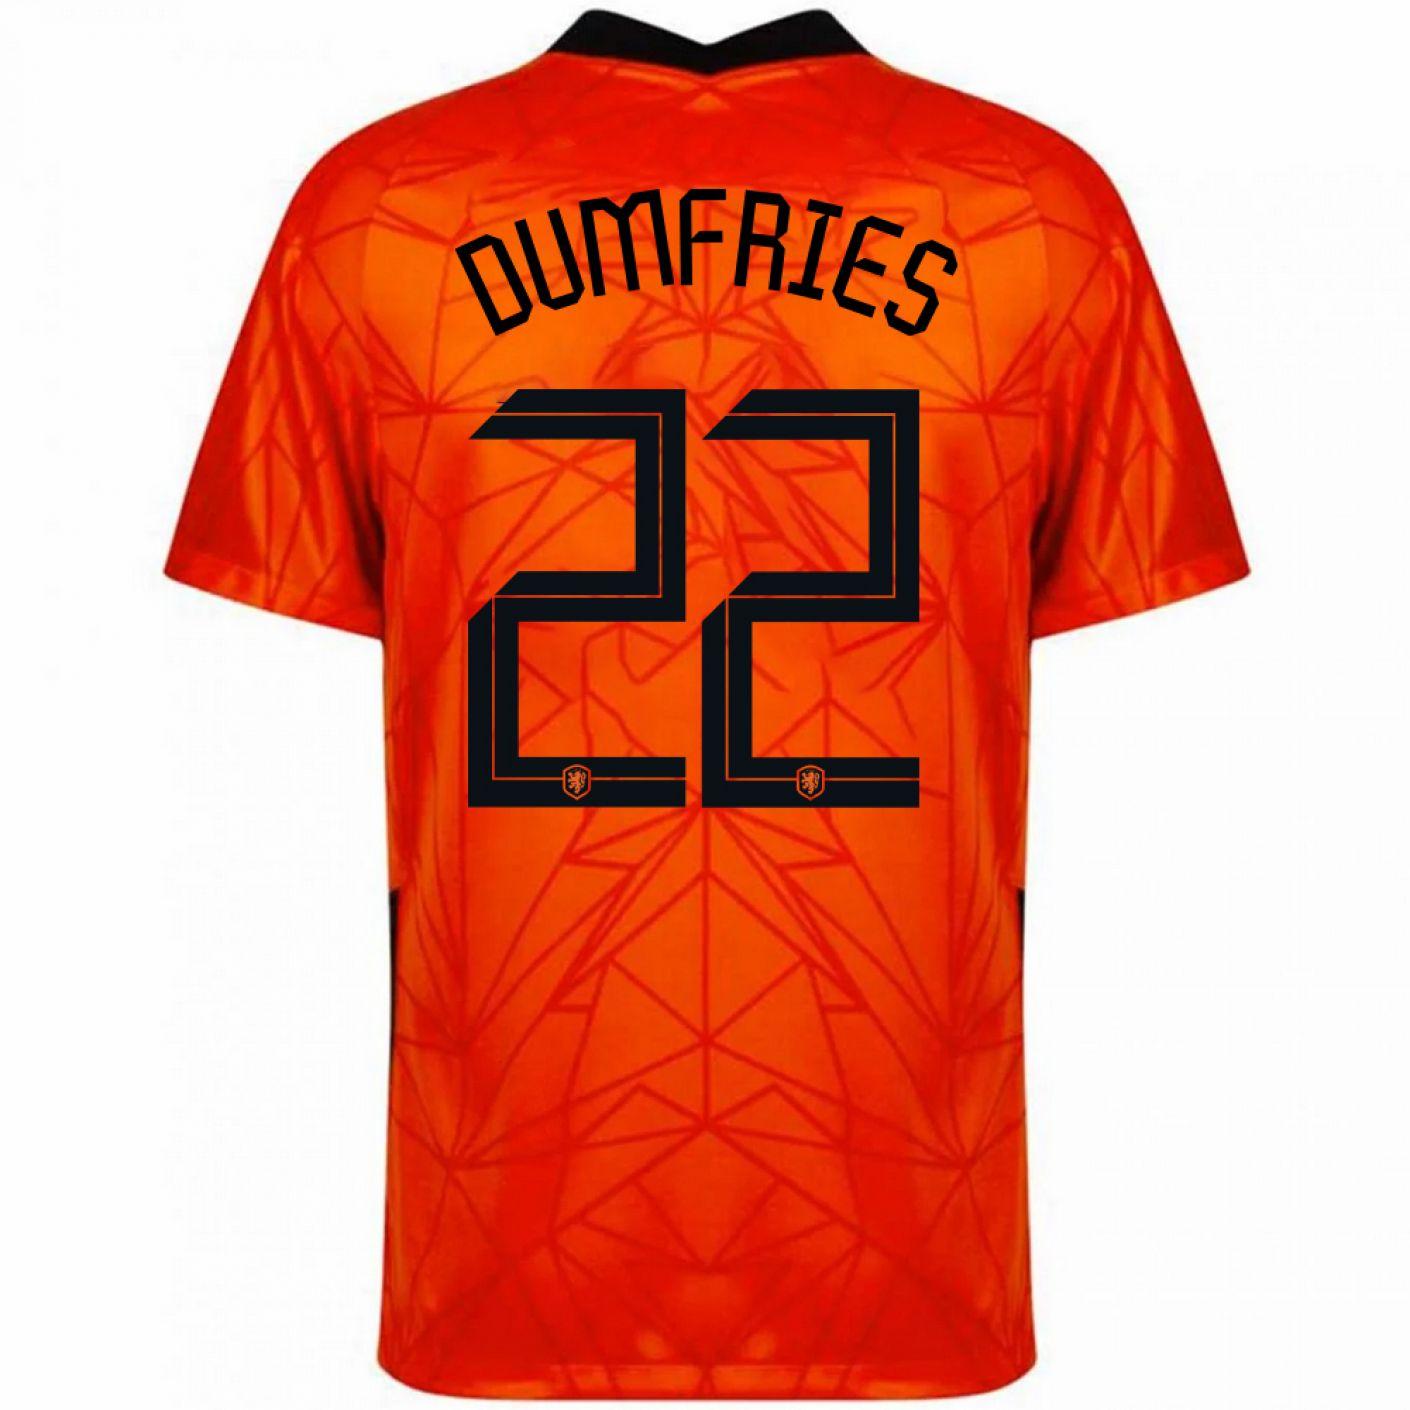 Nike Nederland Dumfries 22 Thuisshirt 2020-2022 Kids